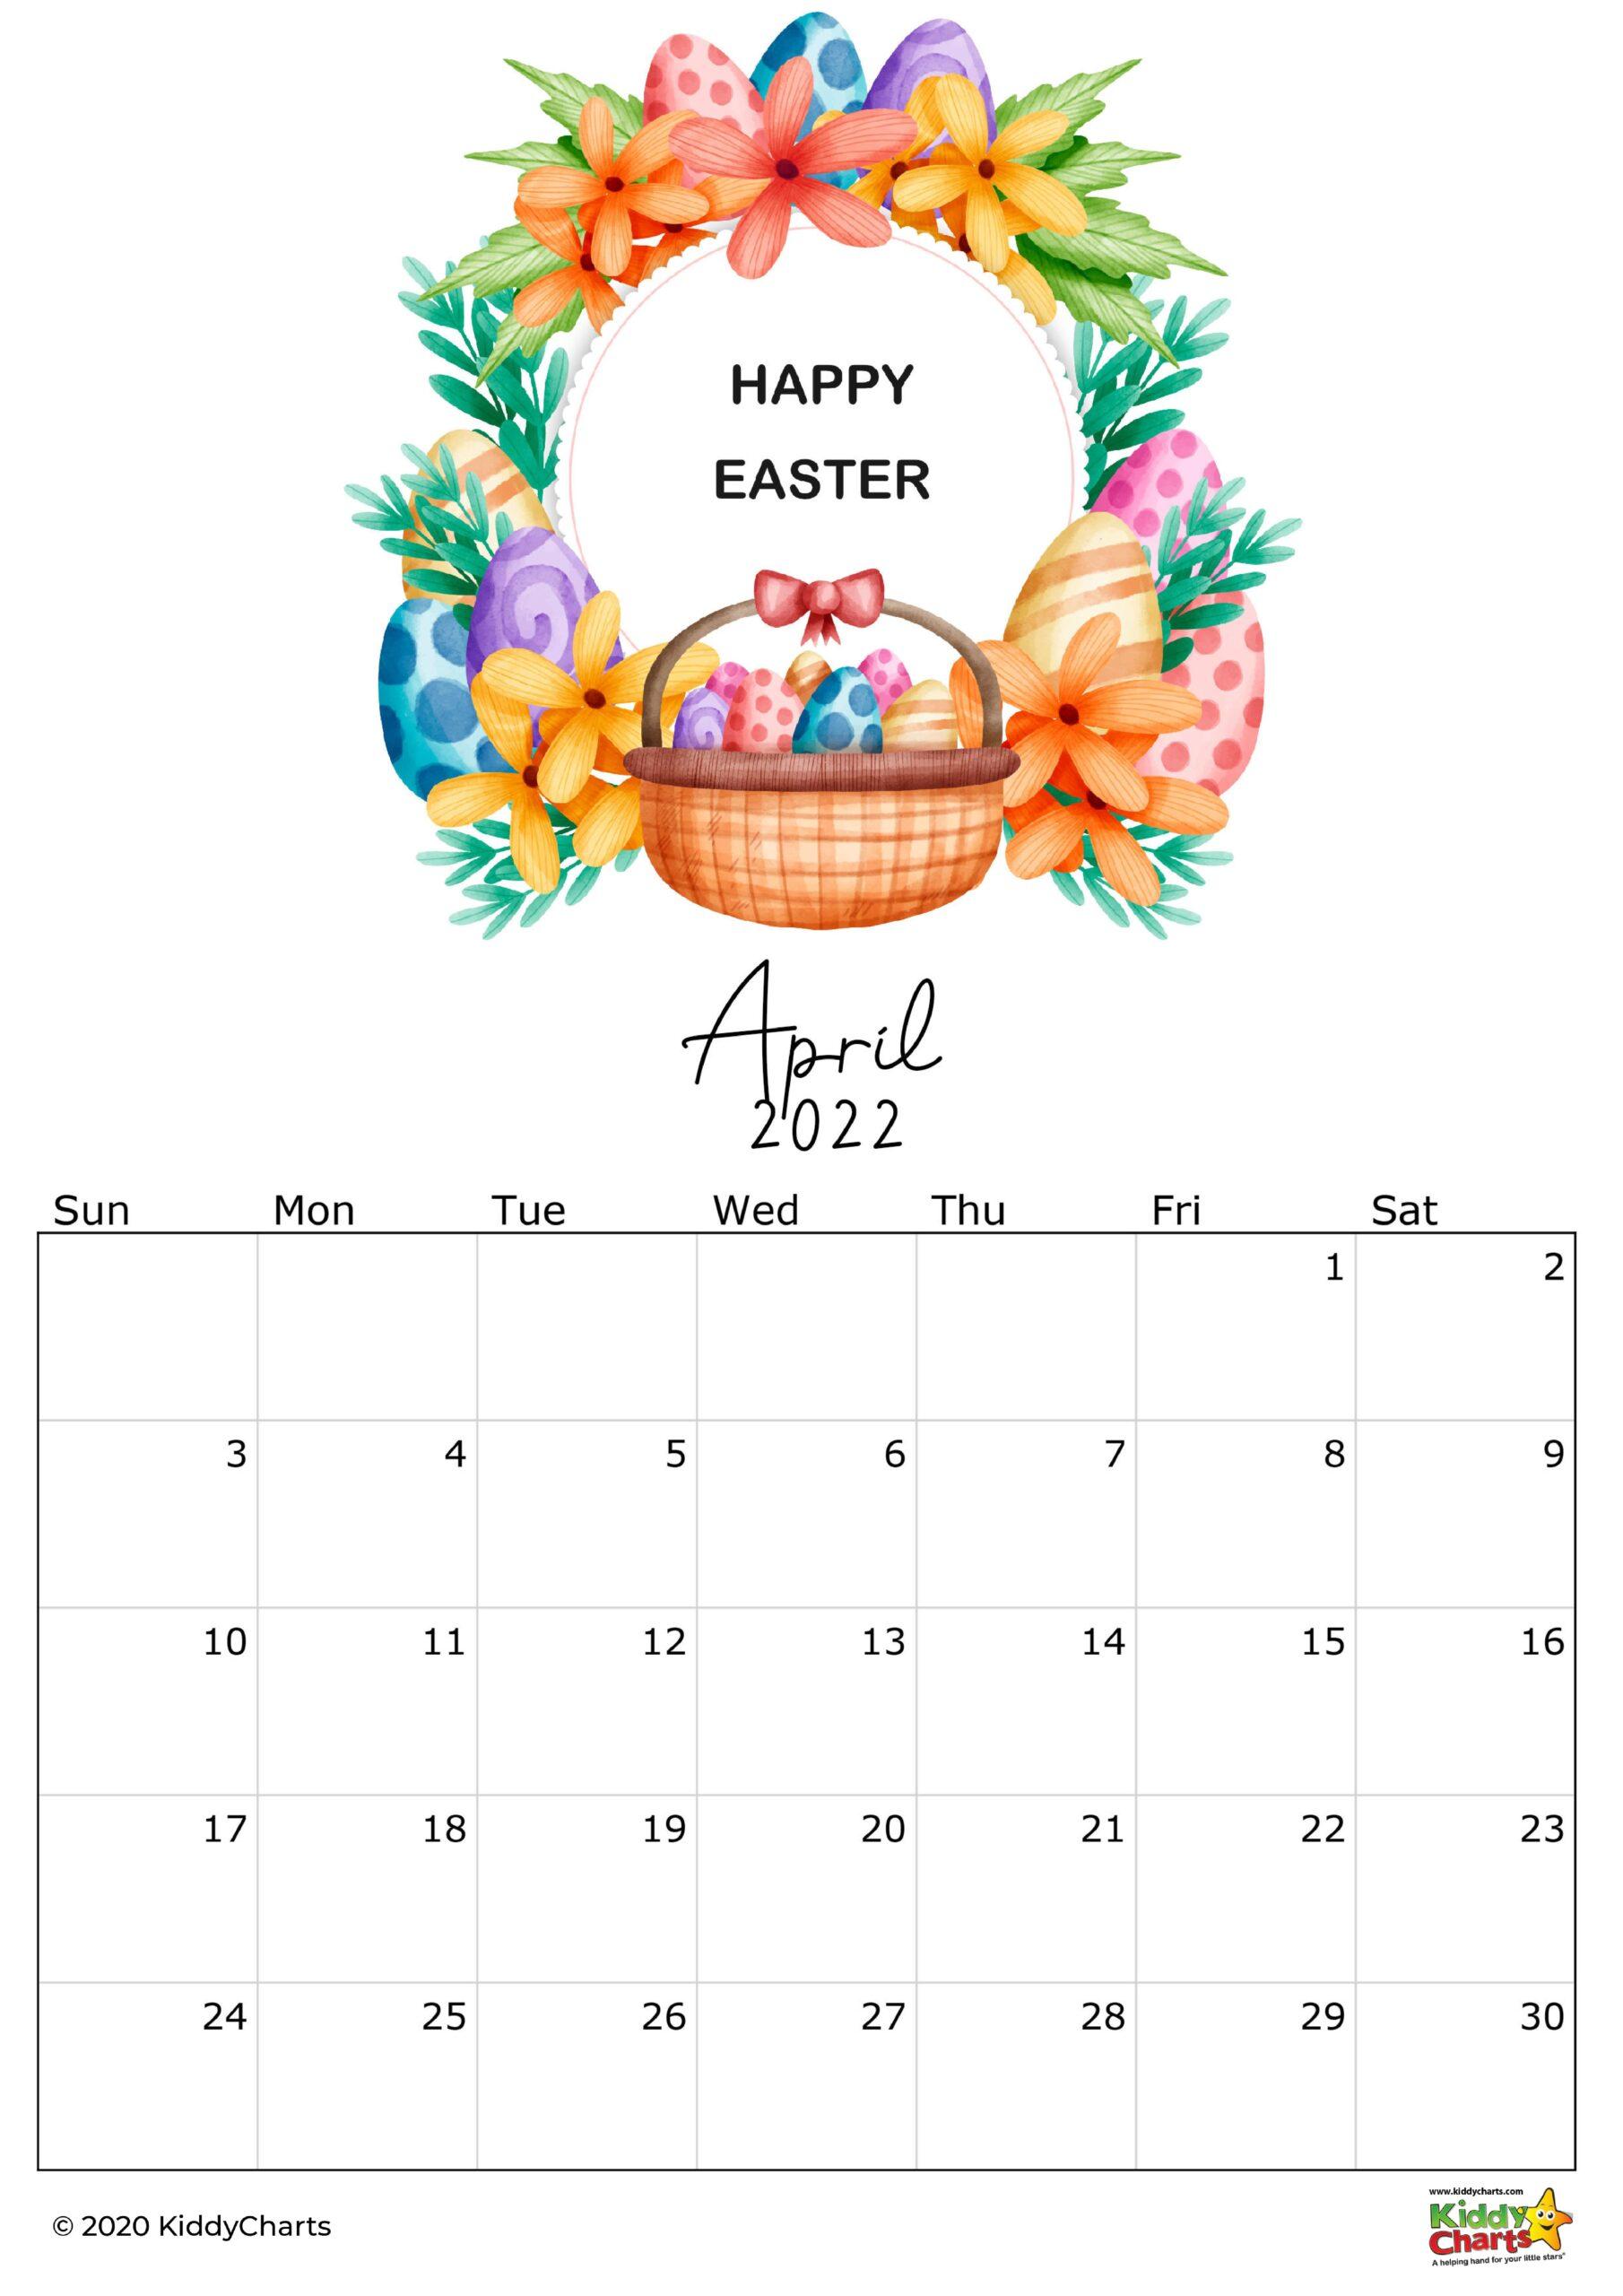 2022 2023 Calendar.2022 Calendar Thats Printable Kids Monthly Snapshots Kiddycharts Com